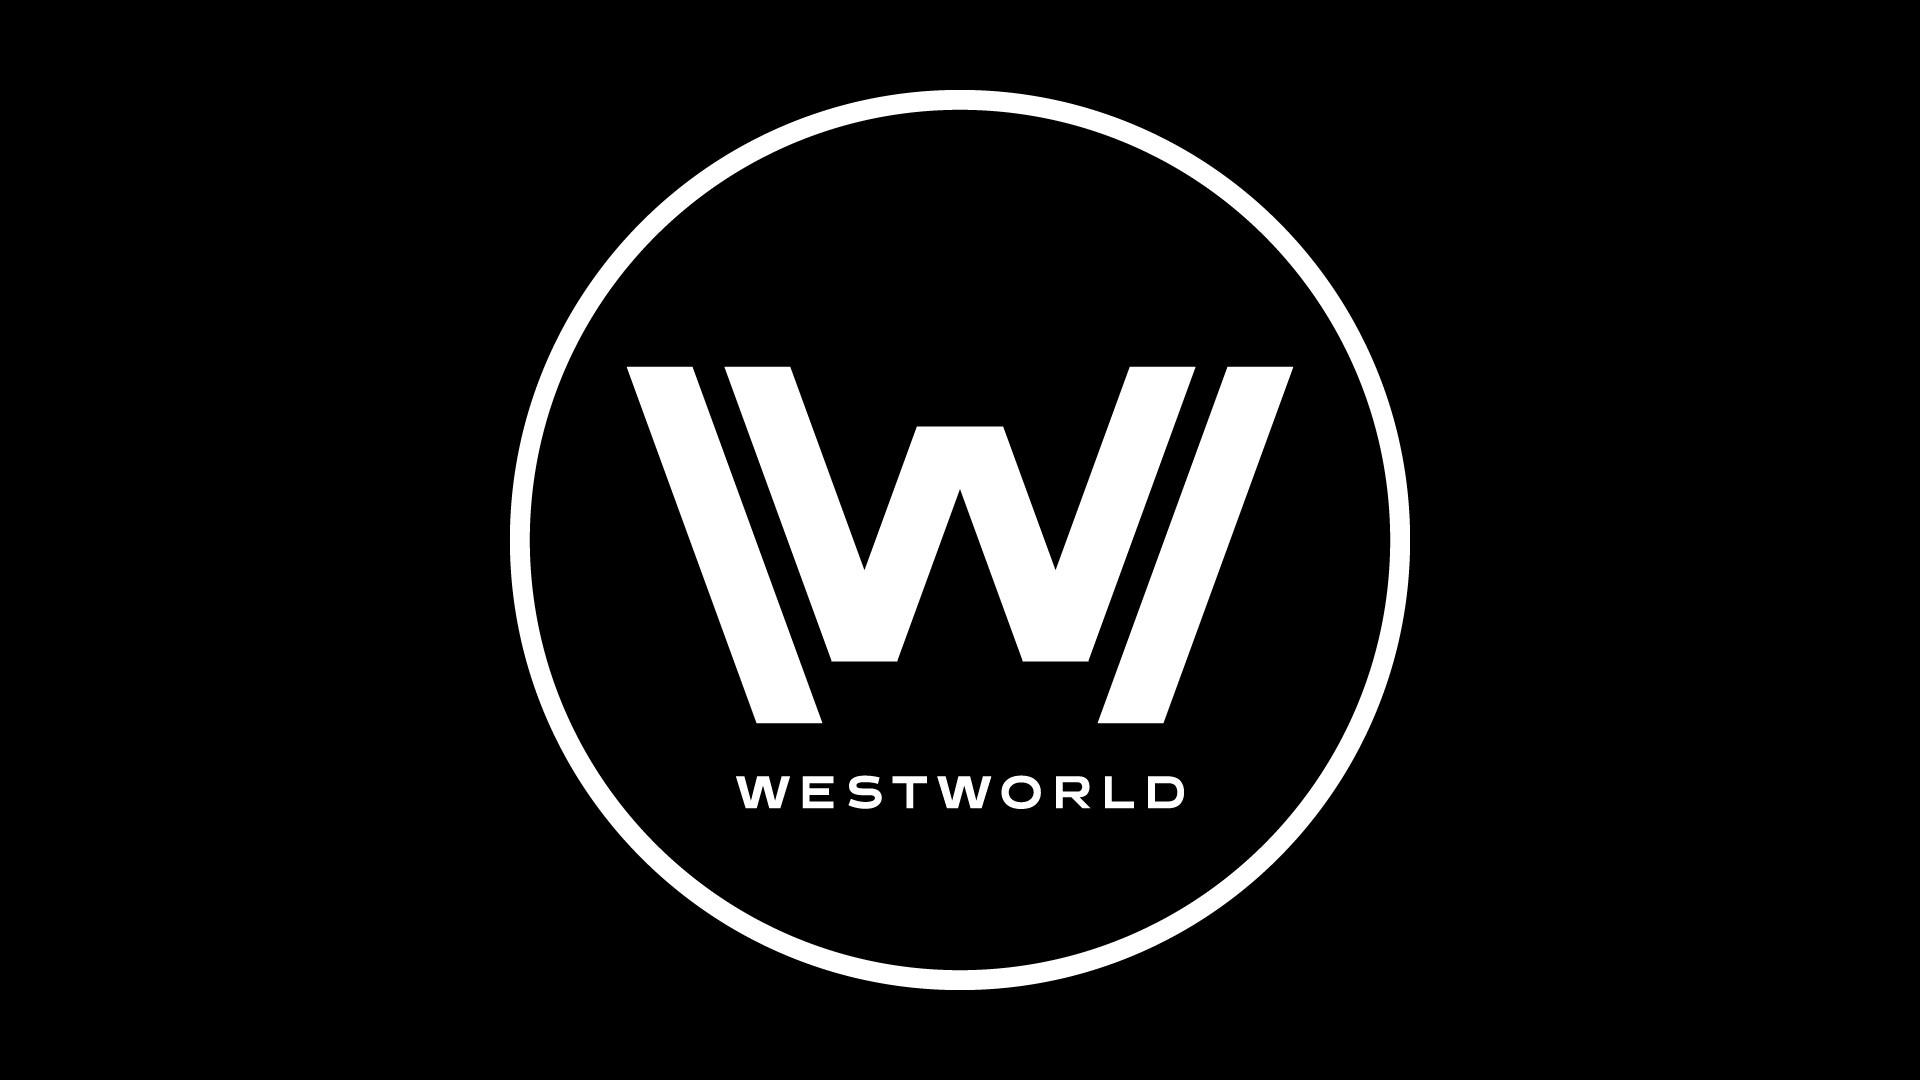 Res: 1920x1080, Download Westworld Season 1 Wallpaper Wide Background #ftlt06kz   px 108.40 KB TV Series Westworld